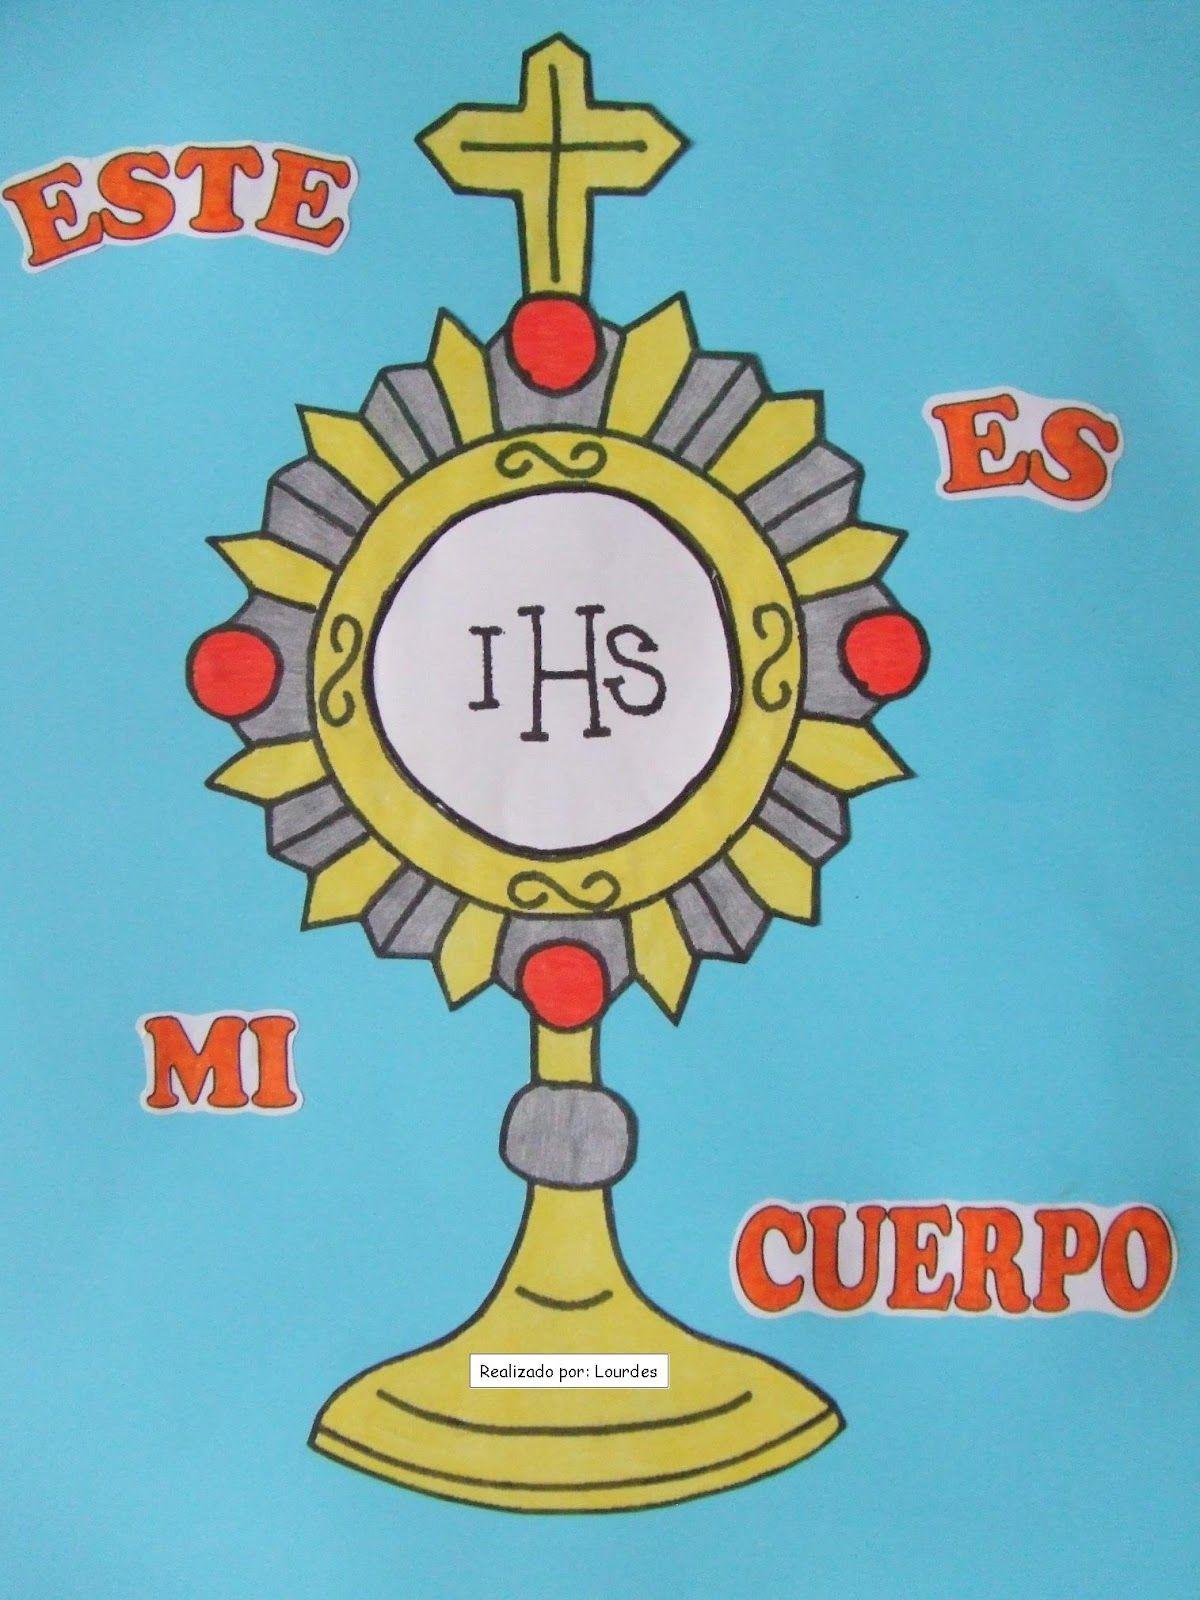 La clase de religi n el corpus christi catequesis - Ninos en clase dibujo ...